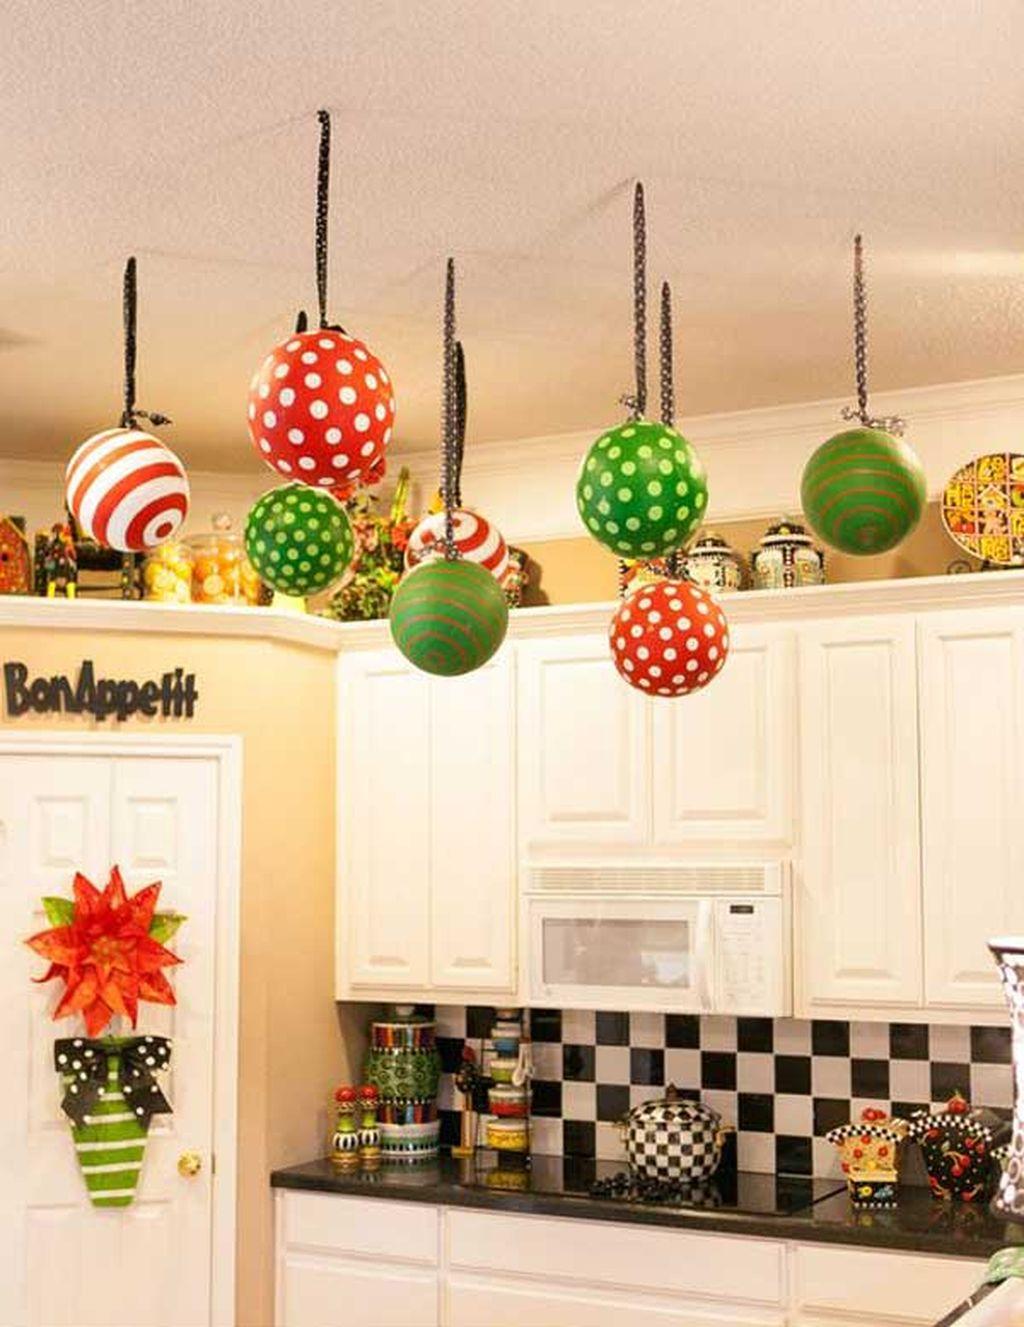 Adorable Rustic Christmas Kitchen Decoration Ideas 65